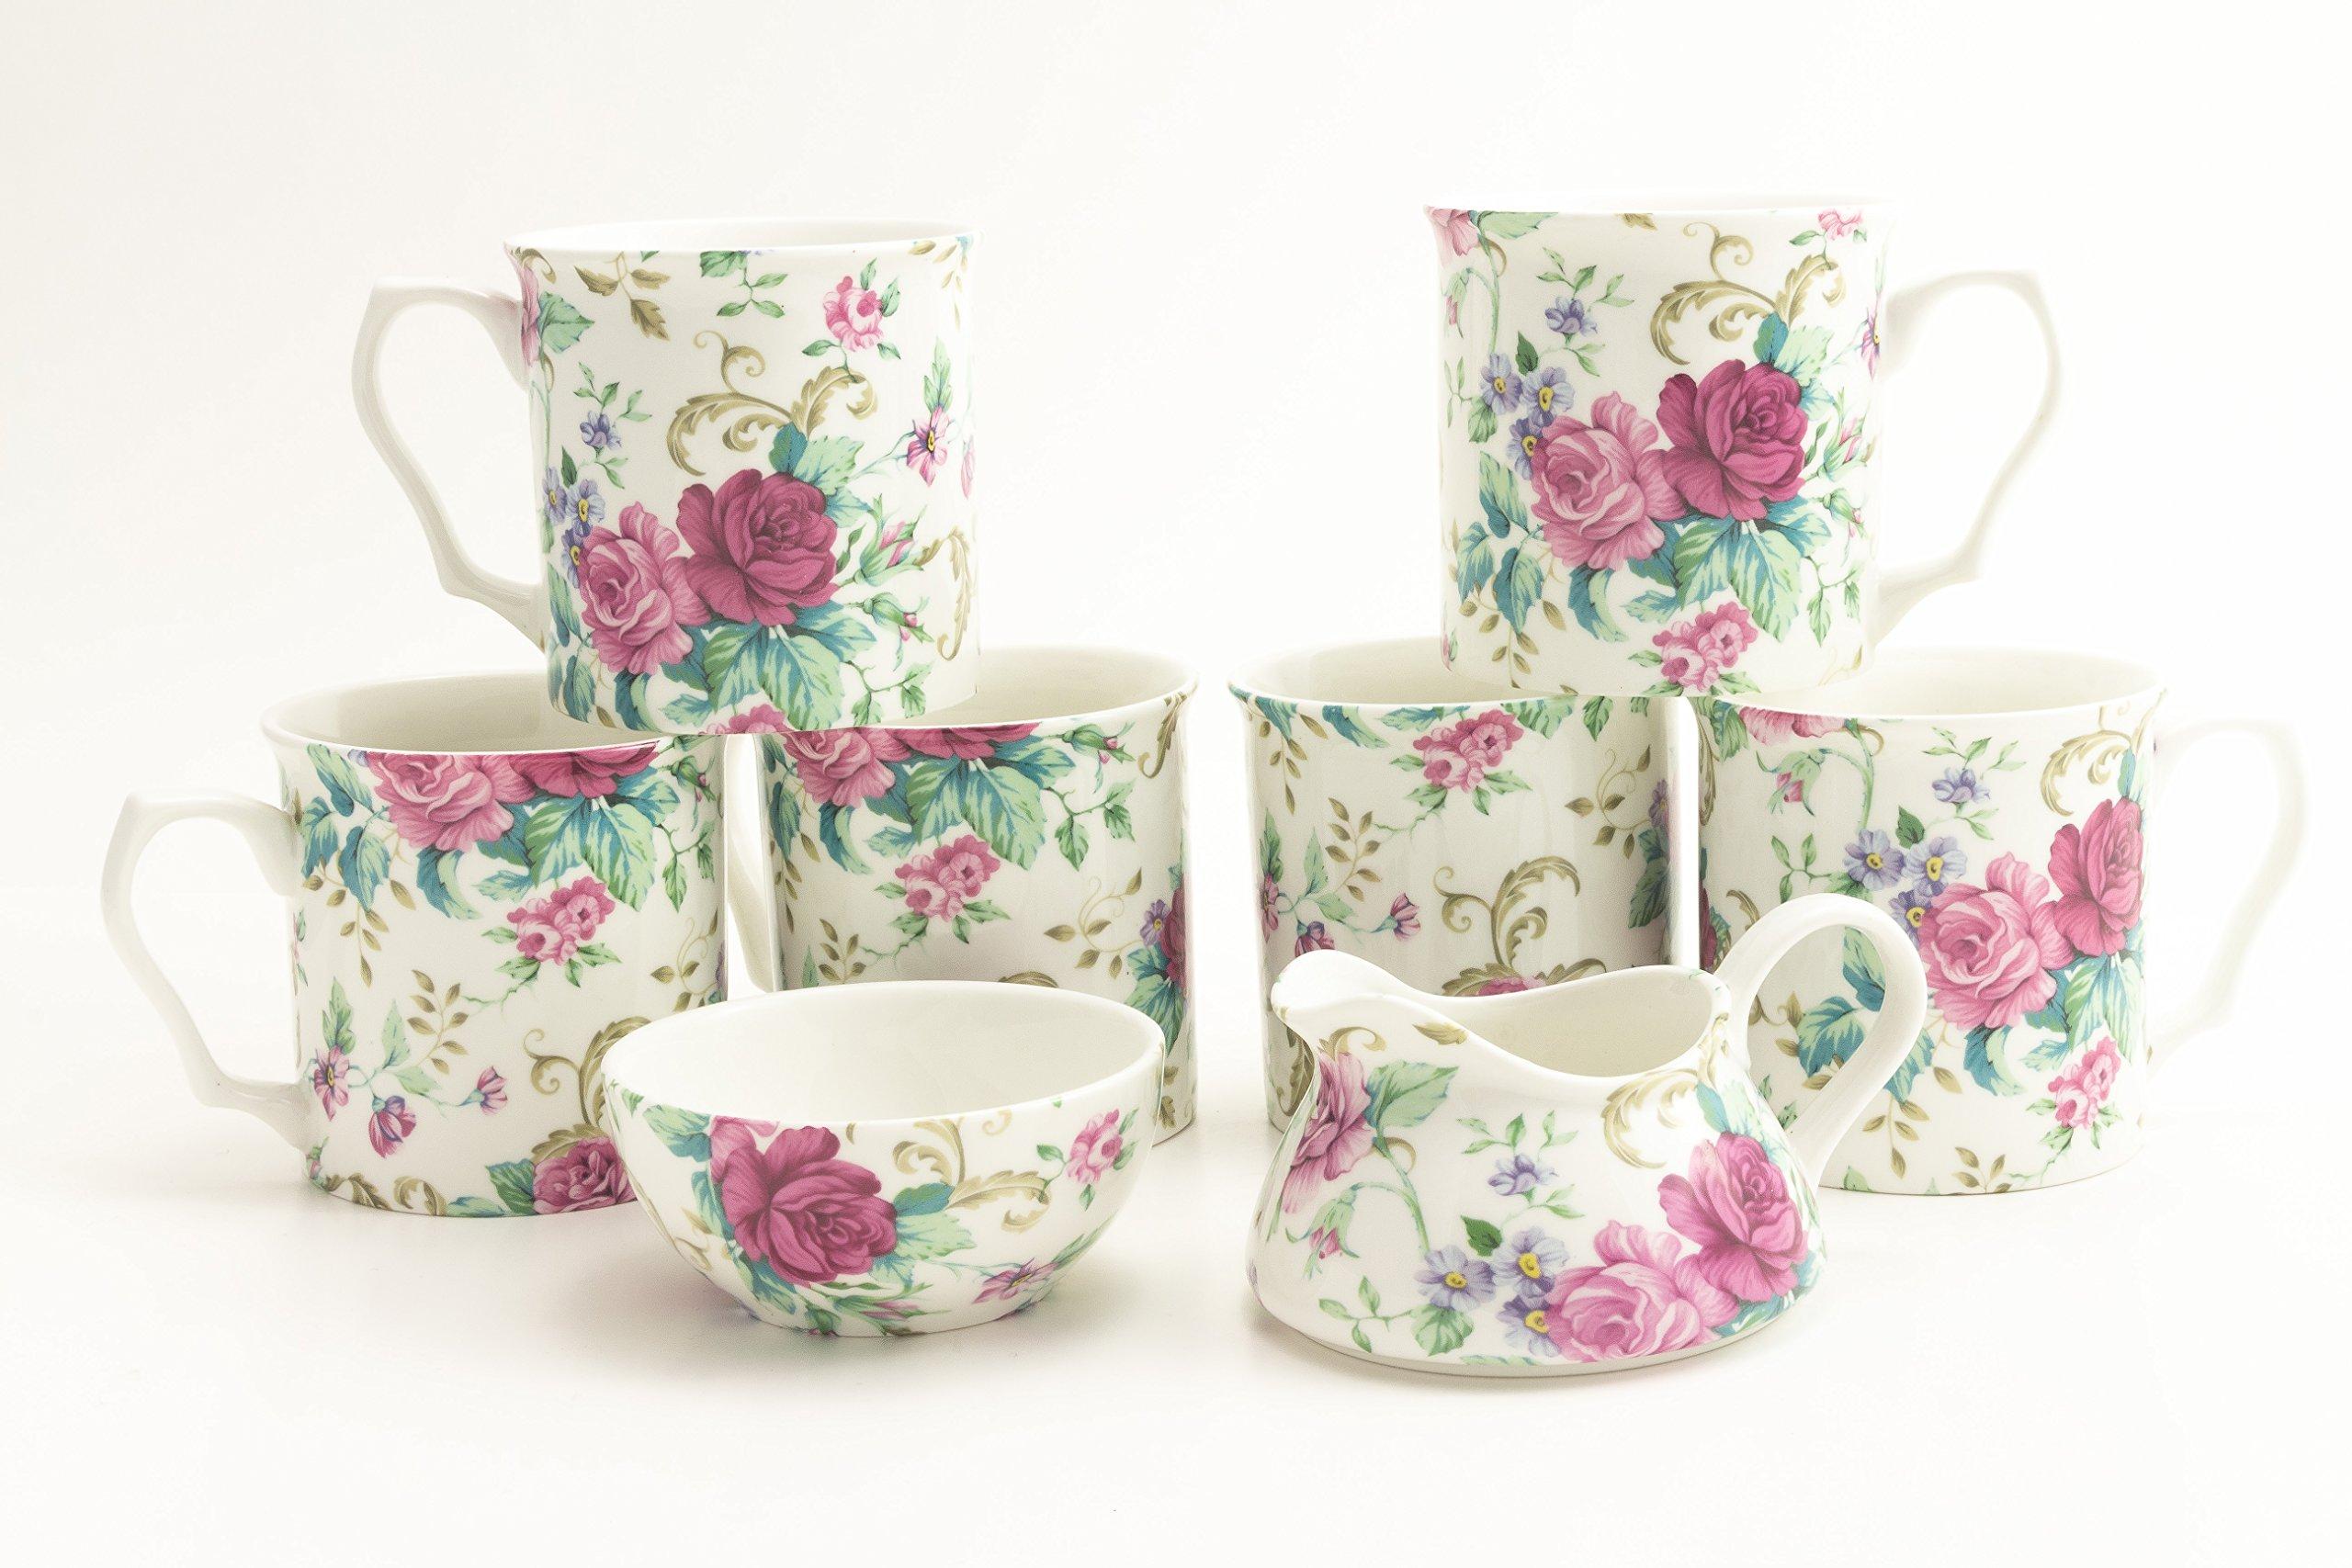 Country Roses Porcelain Gift Set - 6 Porcelain Mugs, 1 Sugar Bowl & Cream - by Shannonbridge Ireland